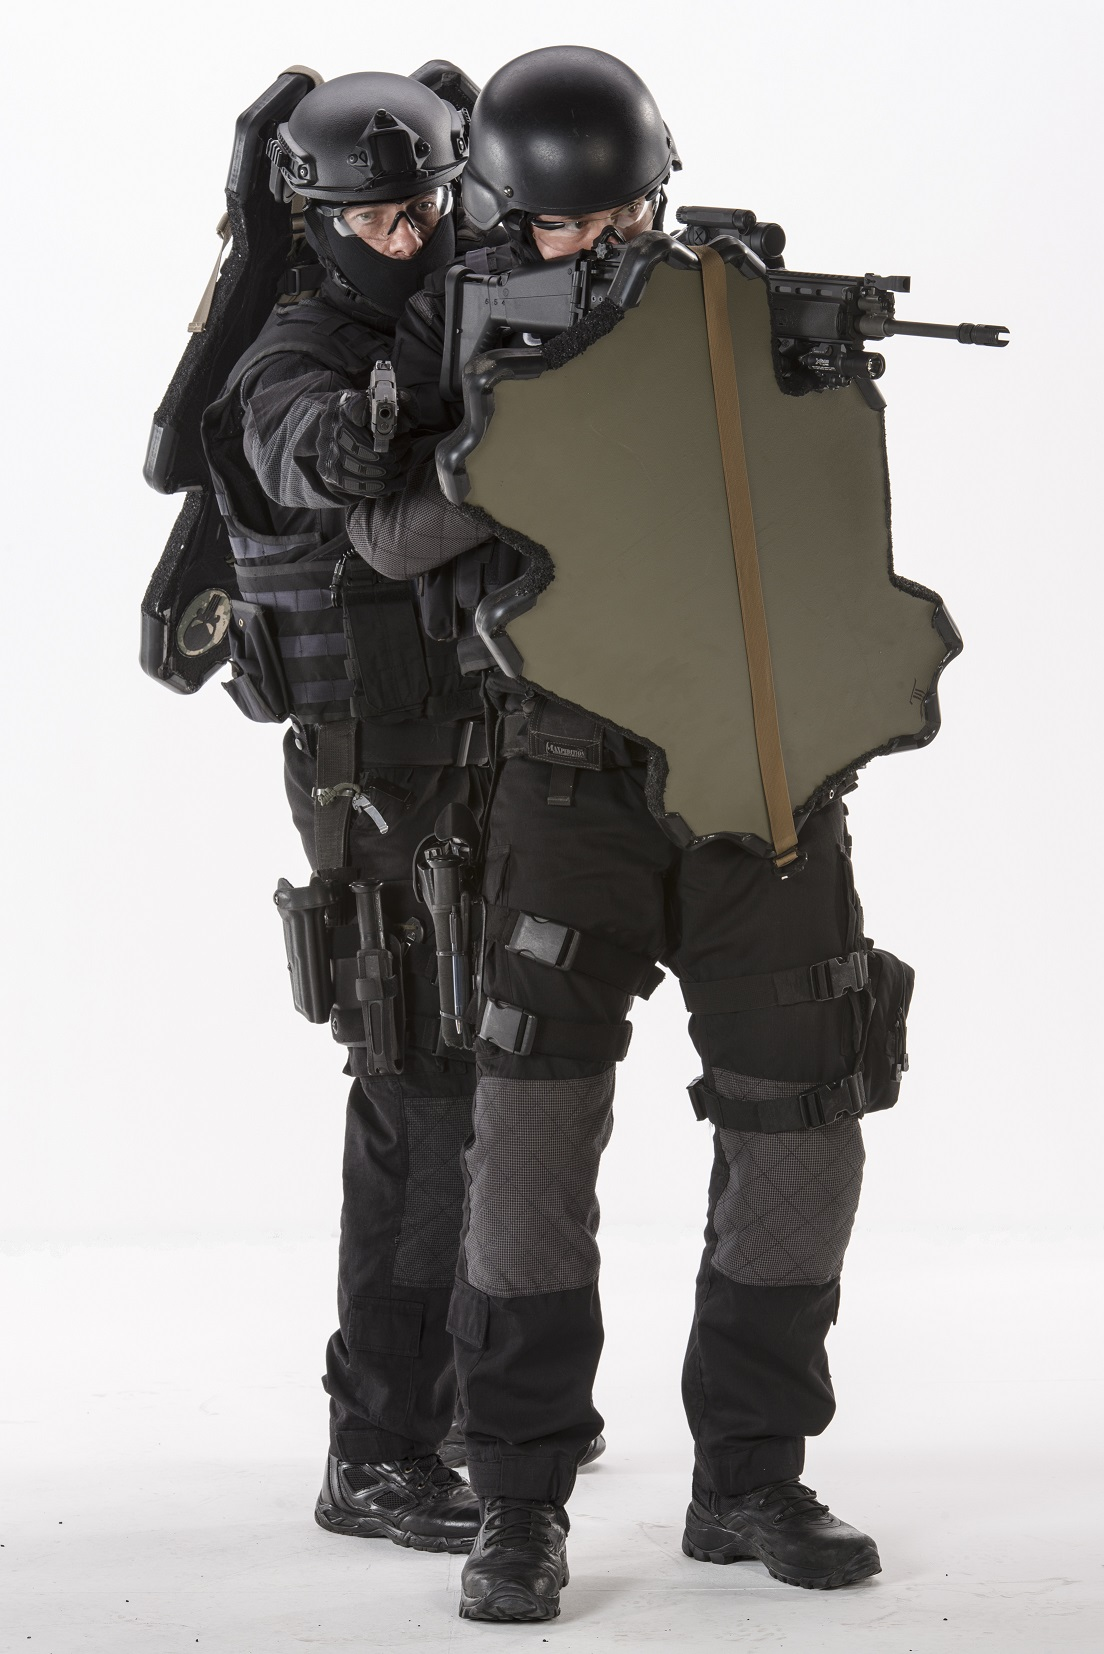 ballistic shields by universal shield morane tactical